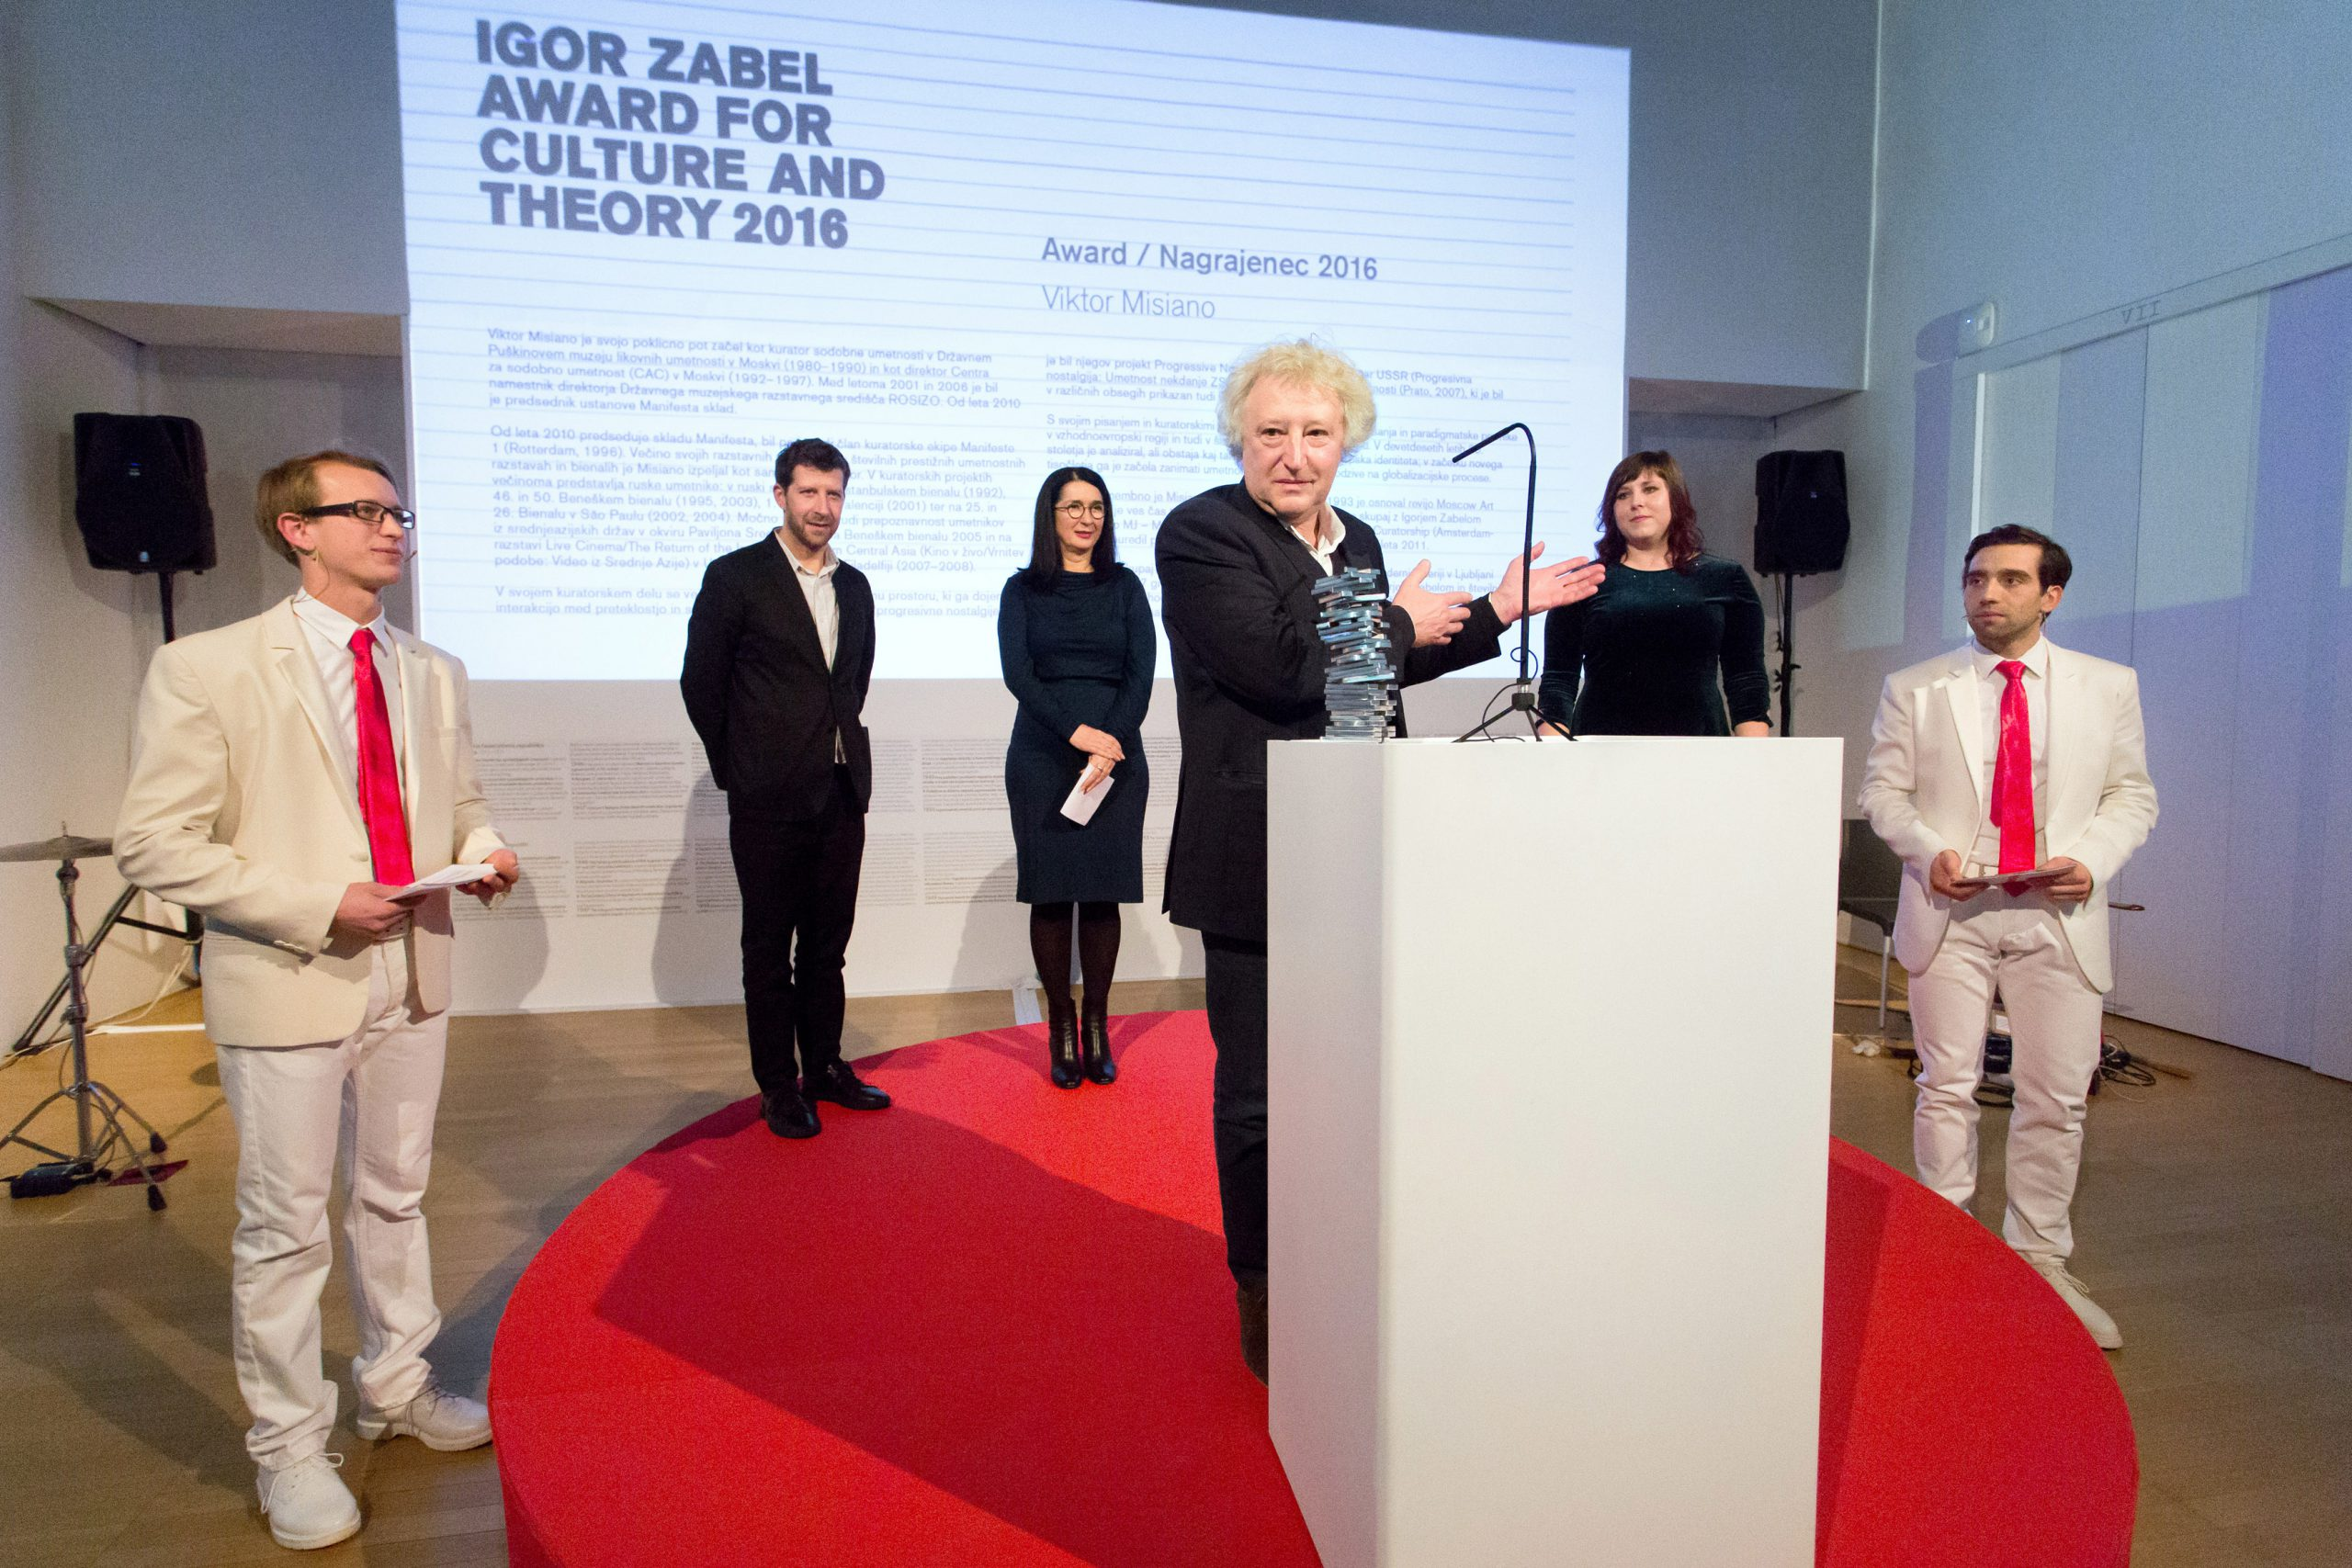 Award Ceremony, THE IGOR ZABEL AWARD FOR CULTURE AND THEORY 2016, Moderna galerija, 9.12.2016 http://www.igorzabel.org/en/news-detail/266_THE+IGOR+ZABEL+AWARD+FOR+CULTURE+AND+THEORY+2016